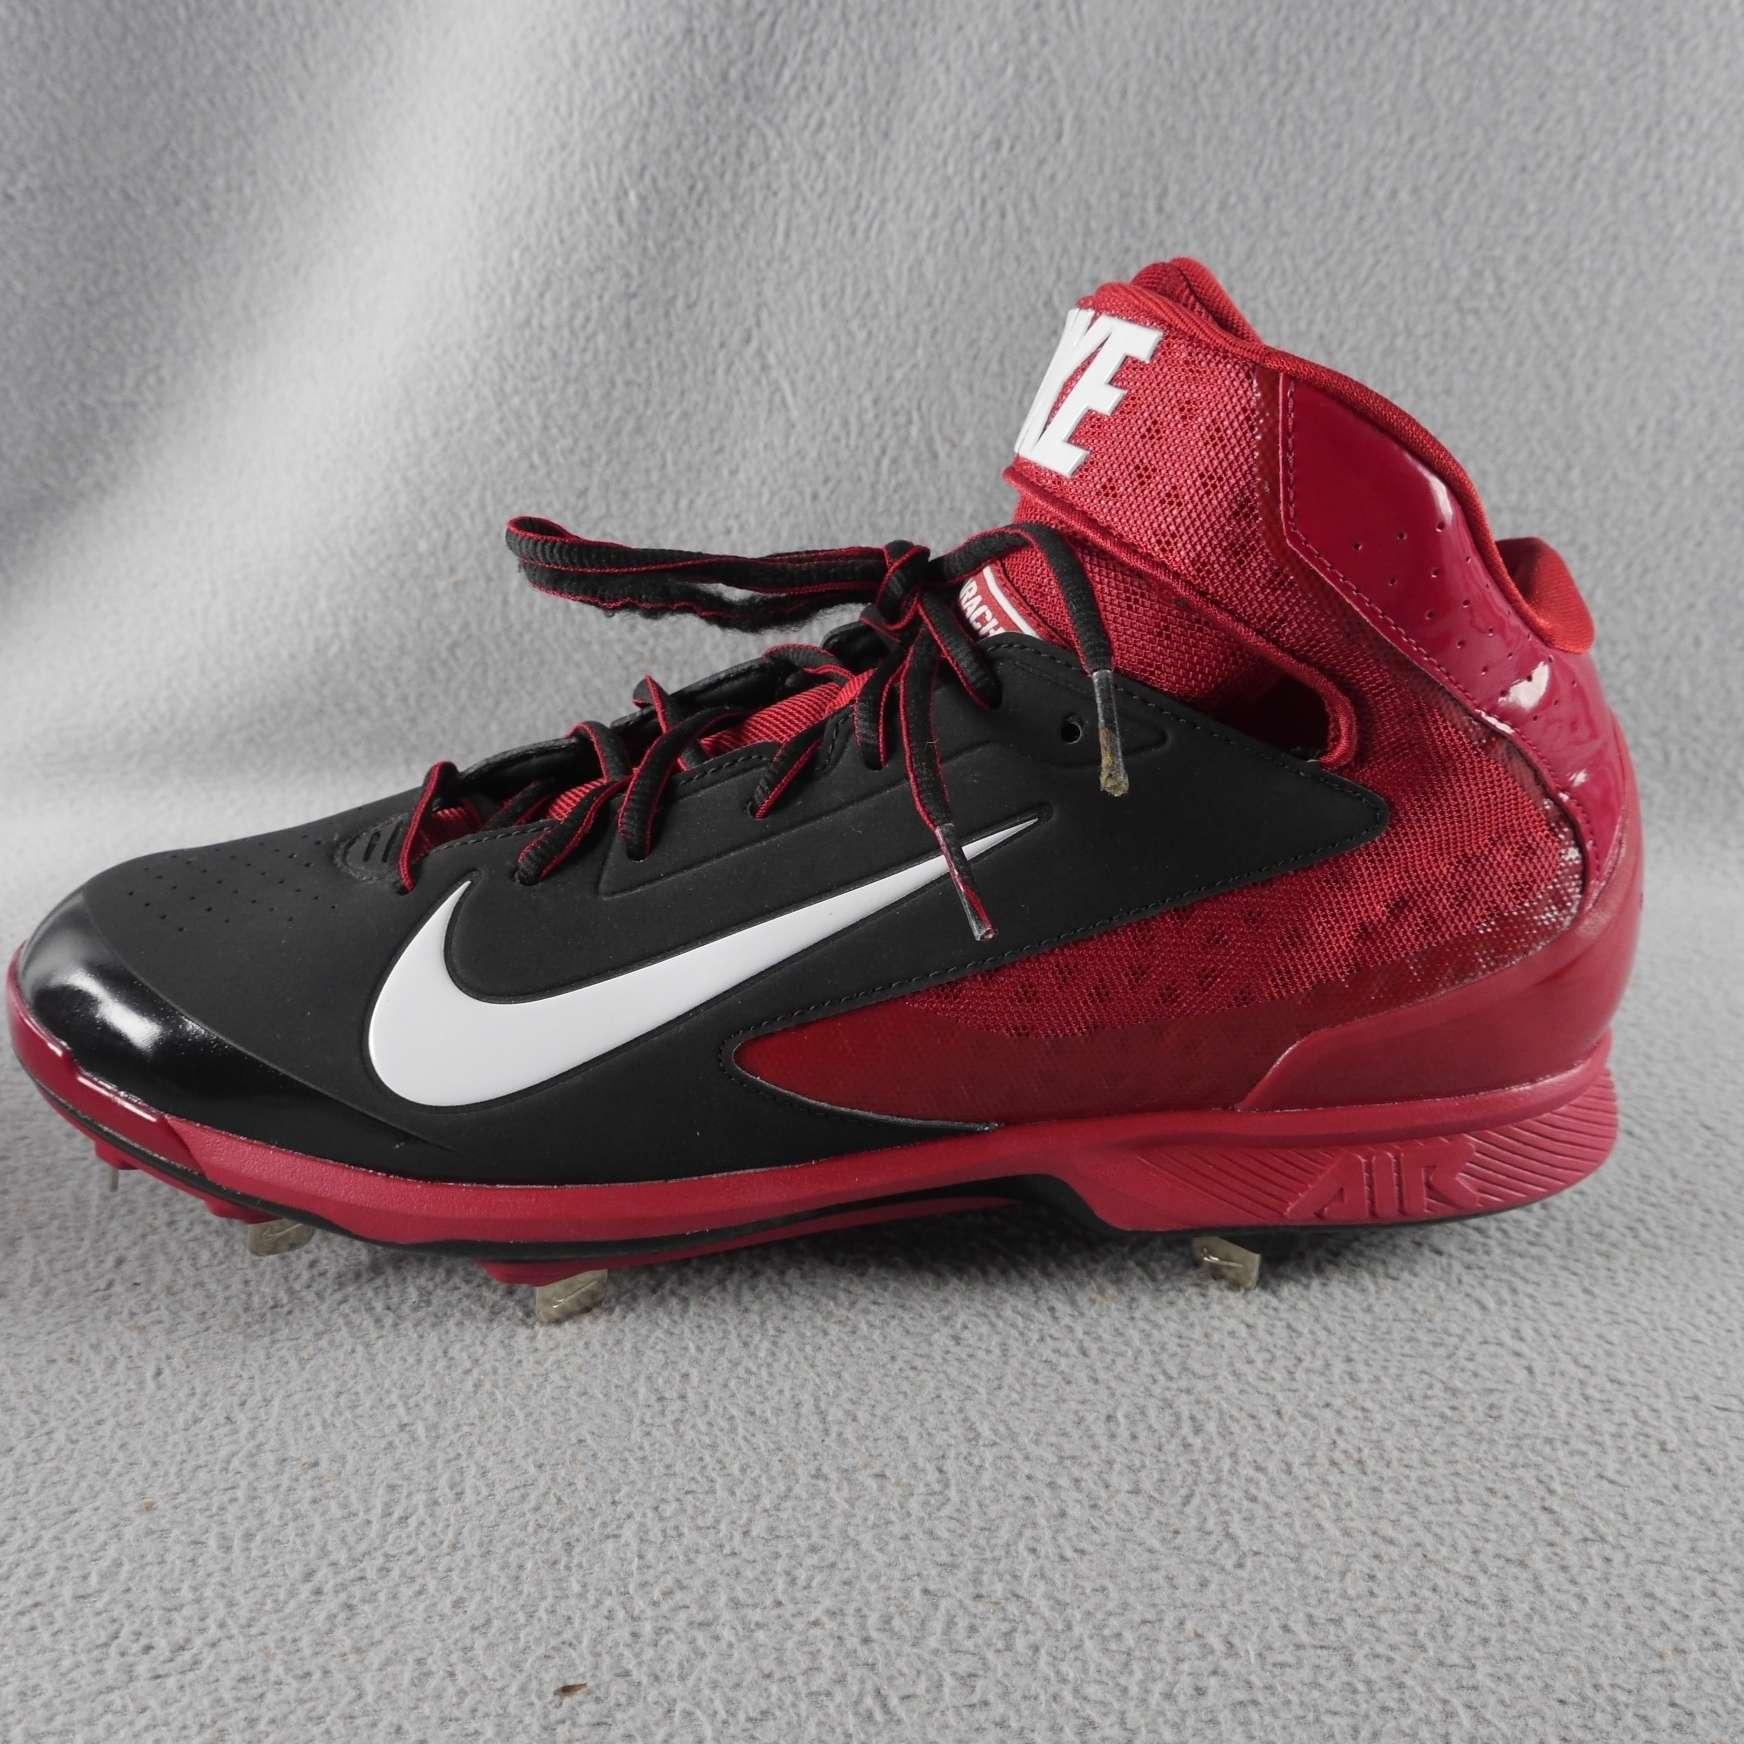 77d9a9672103 NIKE 599235 016 Men s Huarache Baseball Cleats Black Red White SIZE ...